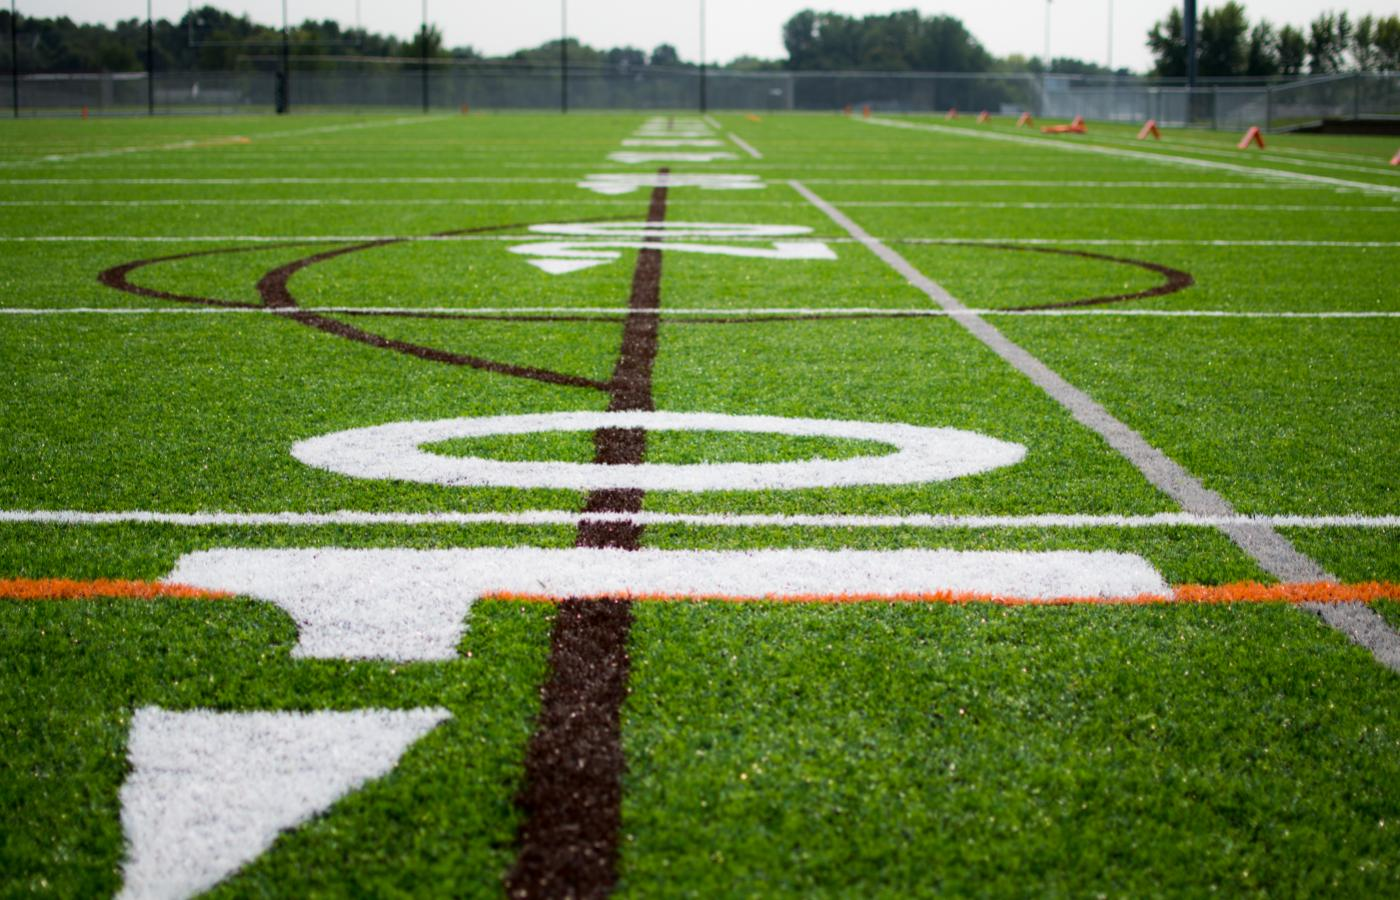 Delano High School Synthetic Turf Fields - 4